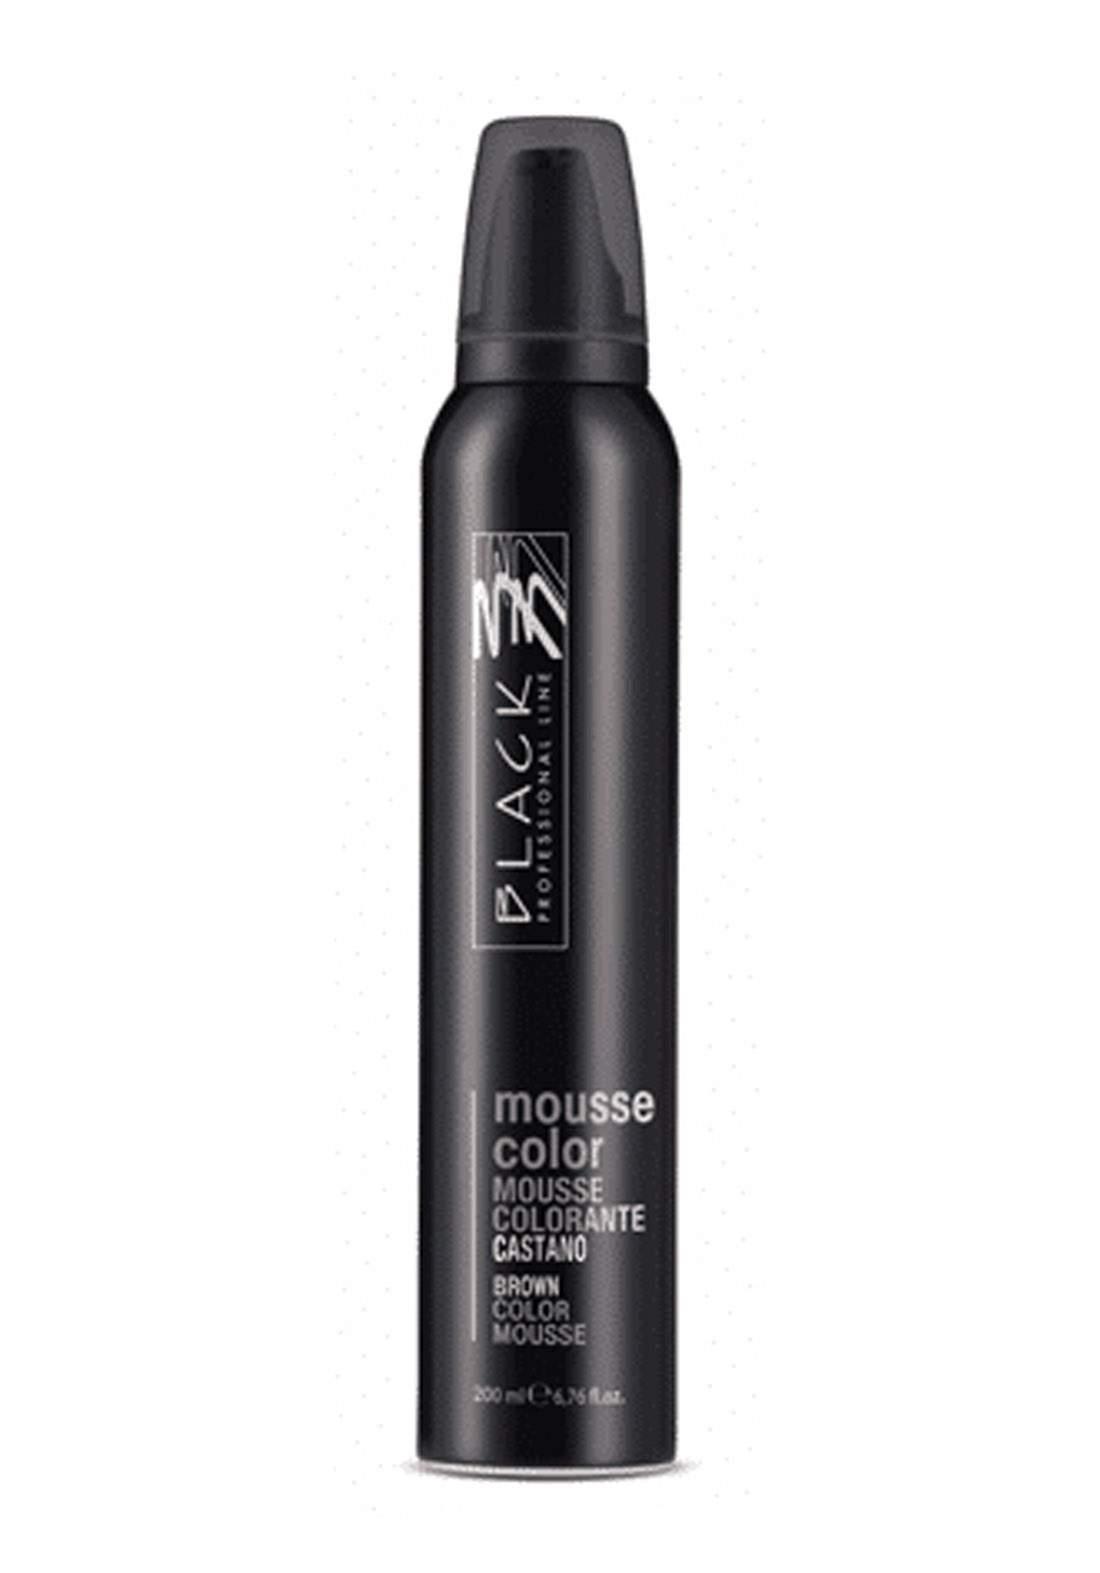 Black Mousse Color Protective Coloring 200ml Brown  موس حماية اللون